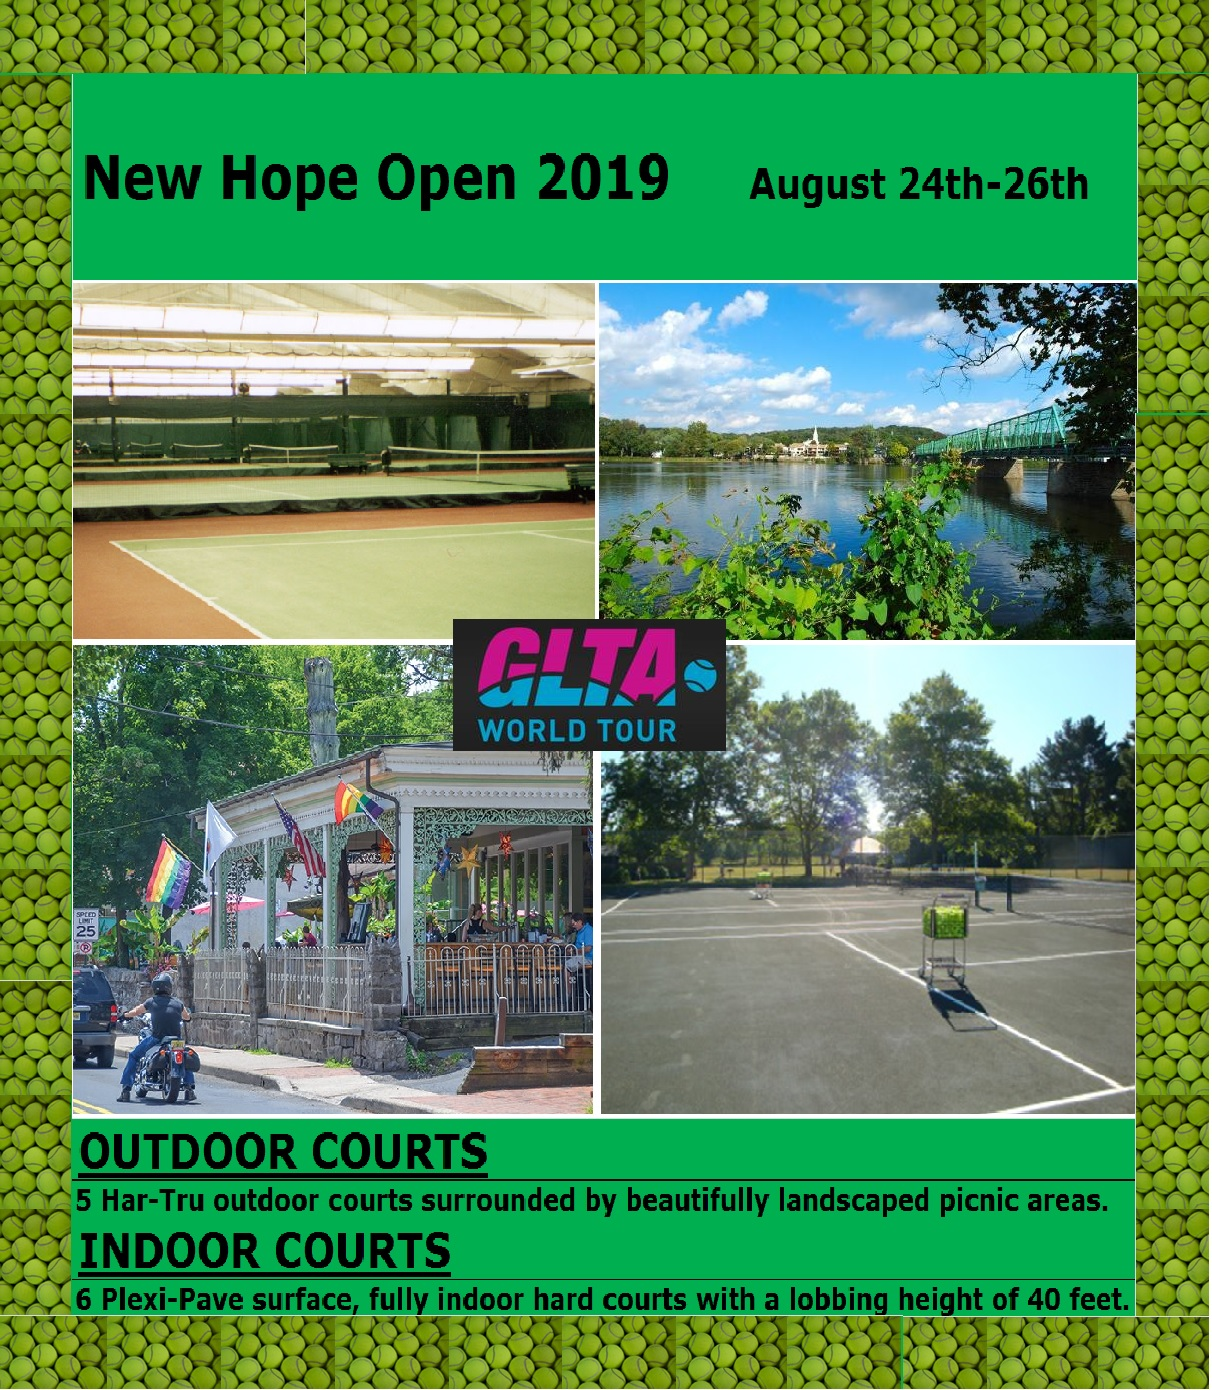 Metropolitan Tennis Group New Hope Open 2019